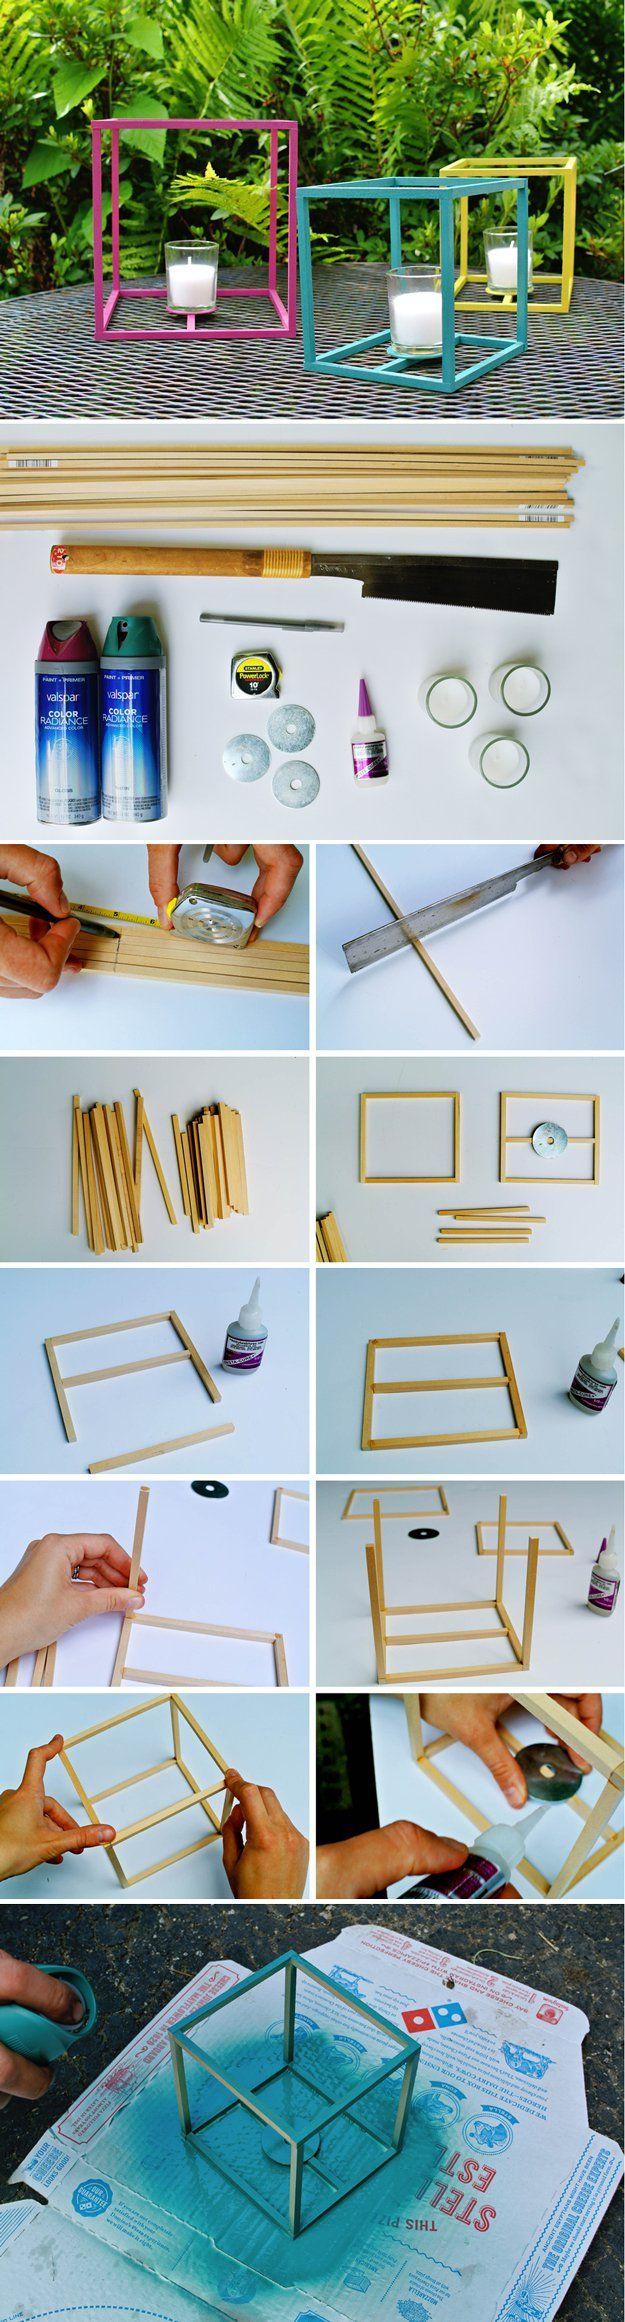 Easy DIY Outdoor Lantern Craft Project | DIY Outdoor Cube Lantern by DIY Ready at http://diyready.com/21-diy-outdoor-lantern-ideas/